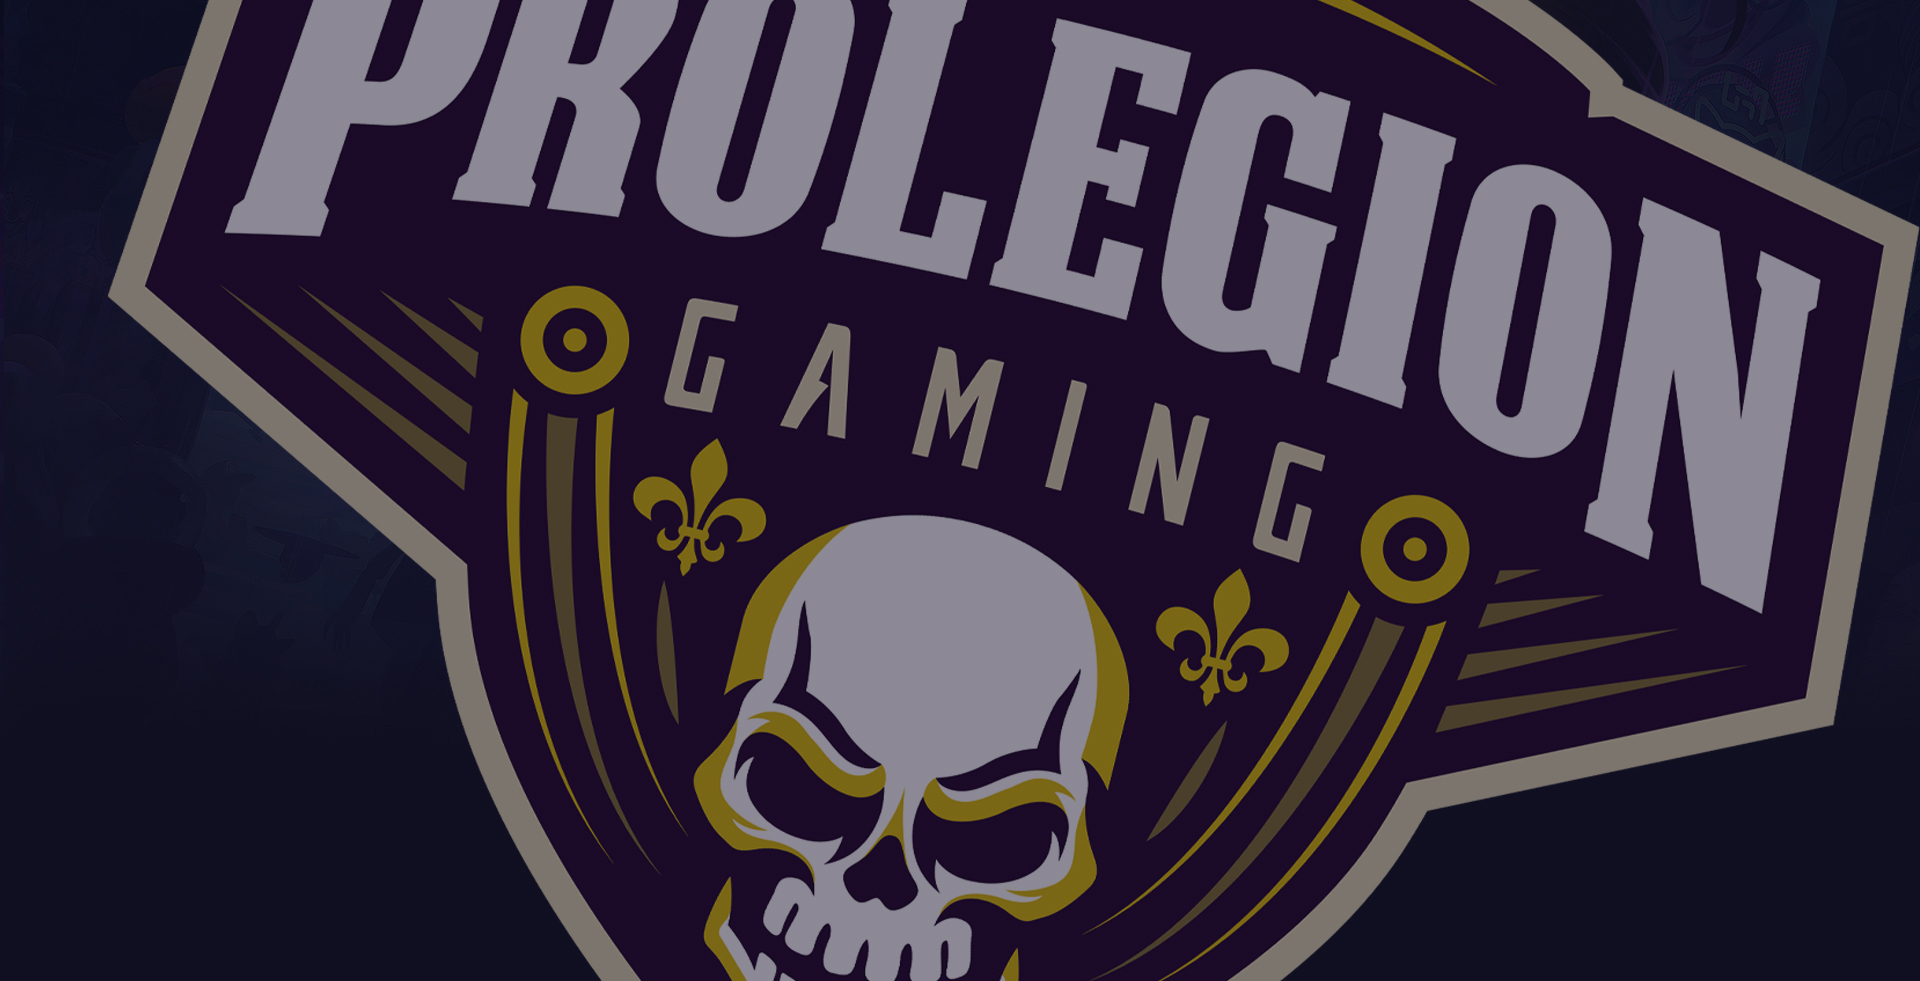 ProLegion Gaming announces new CS:GO team for 2019